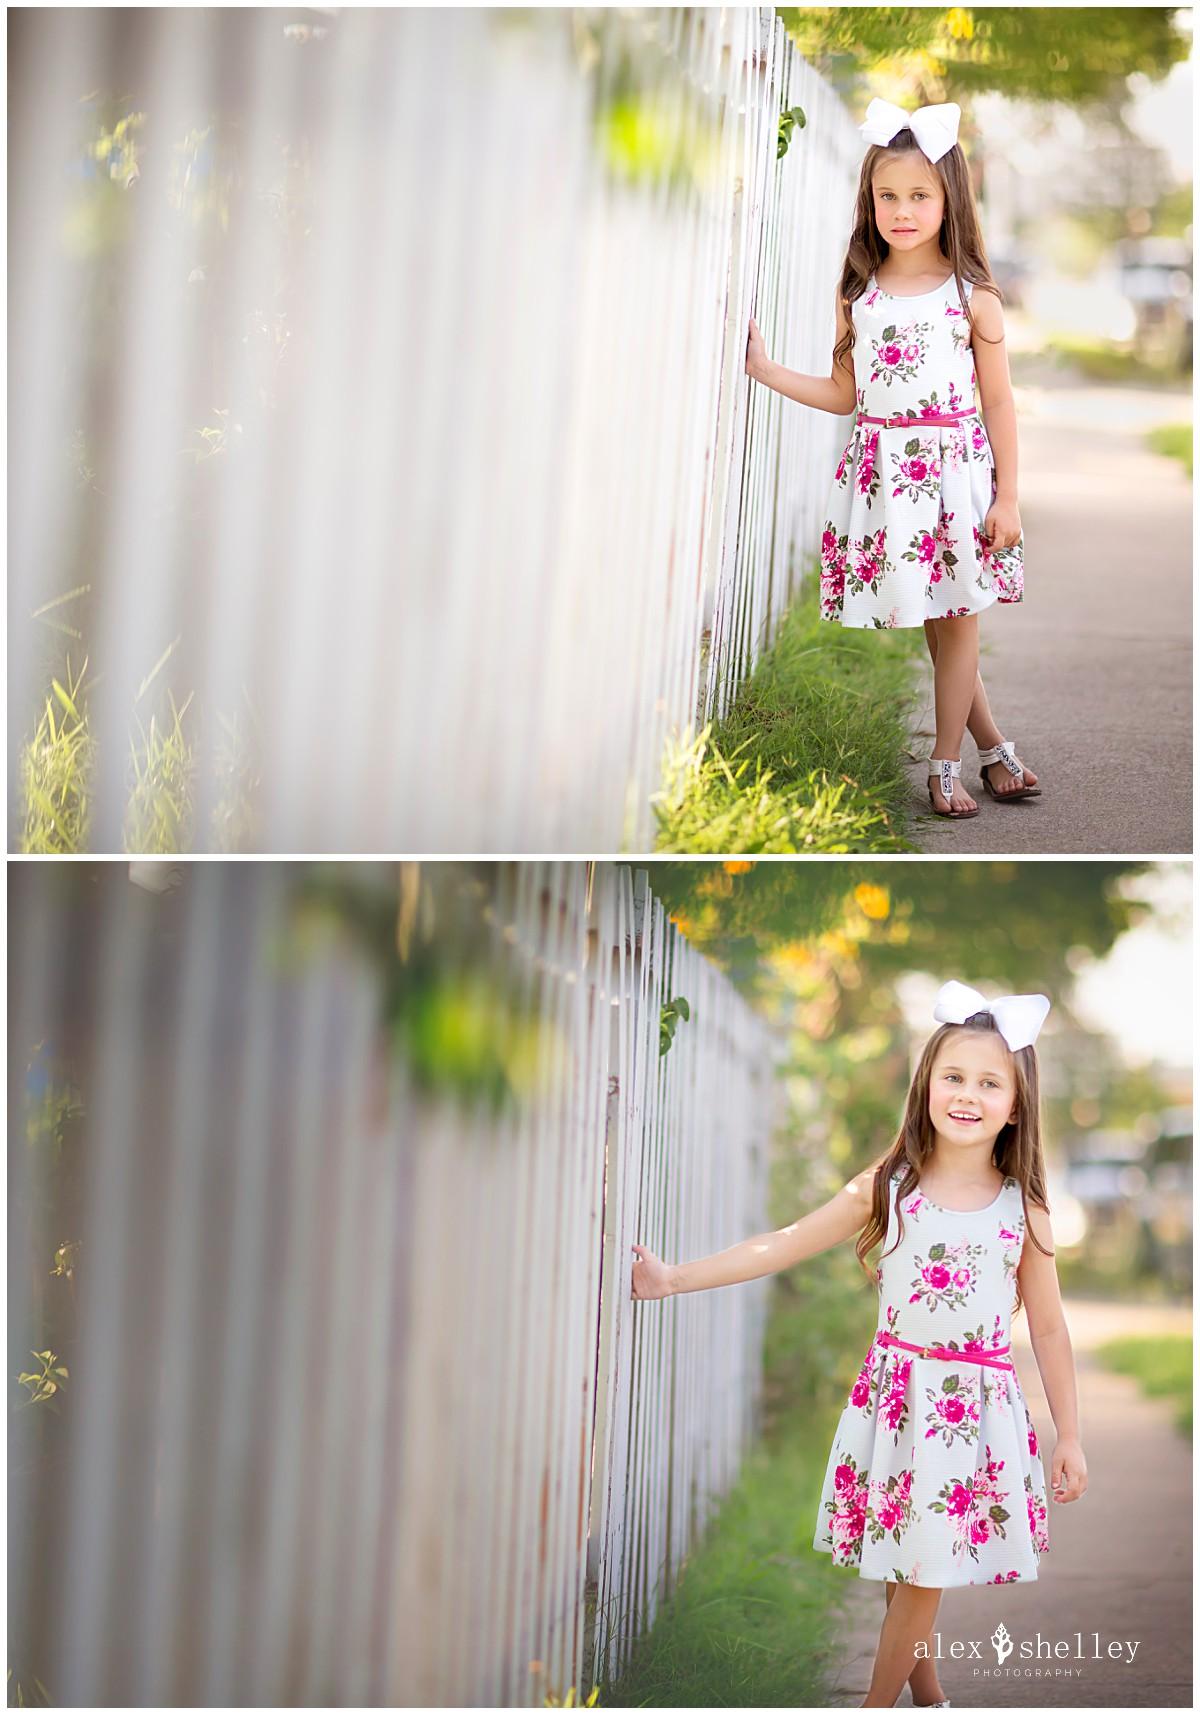 alexshelleyphotography-fortworth_0021